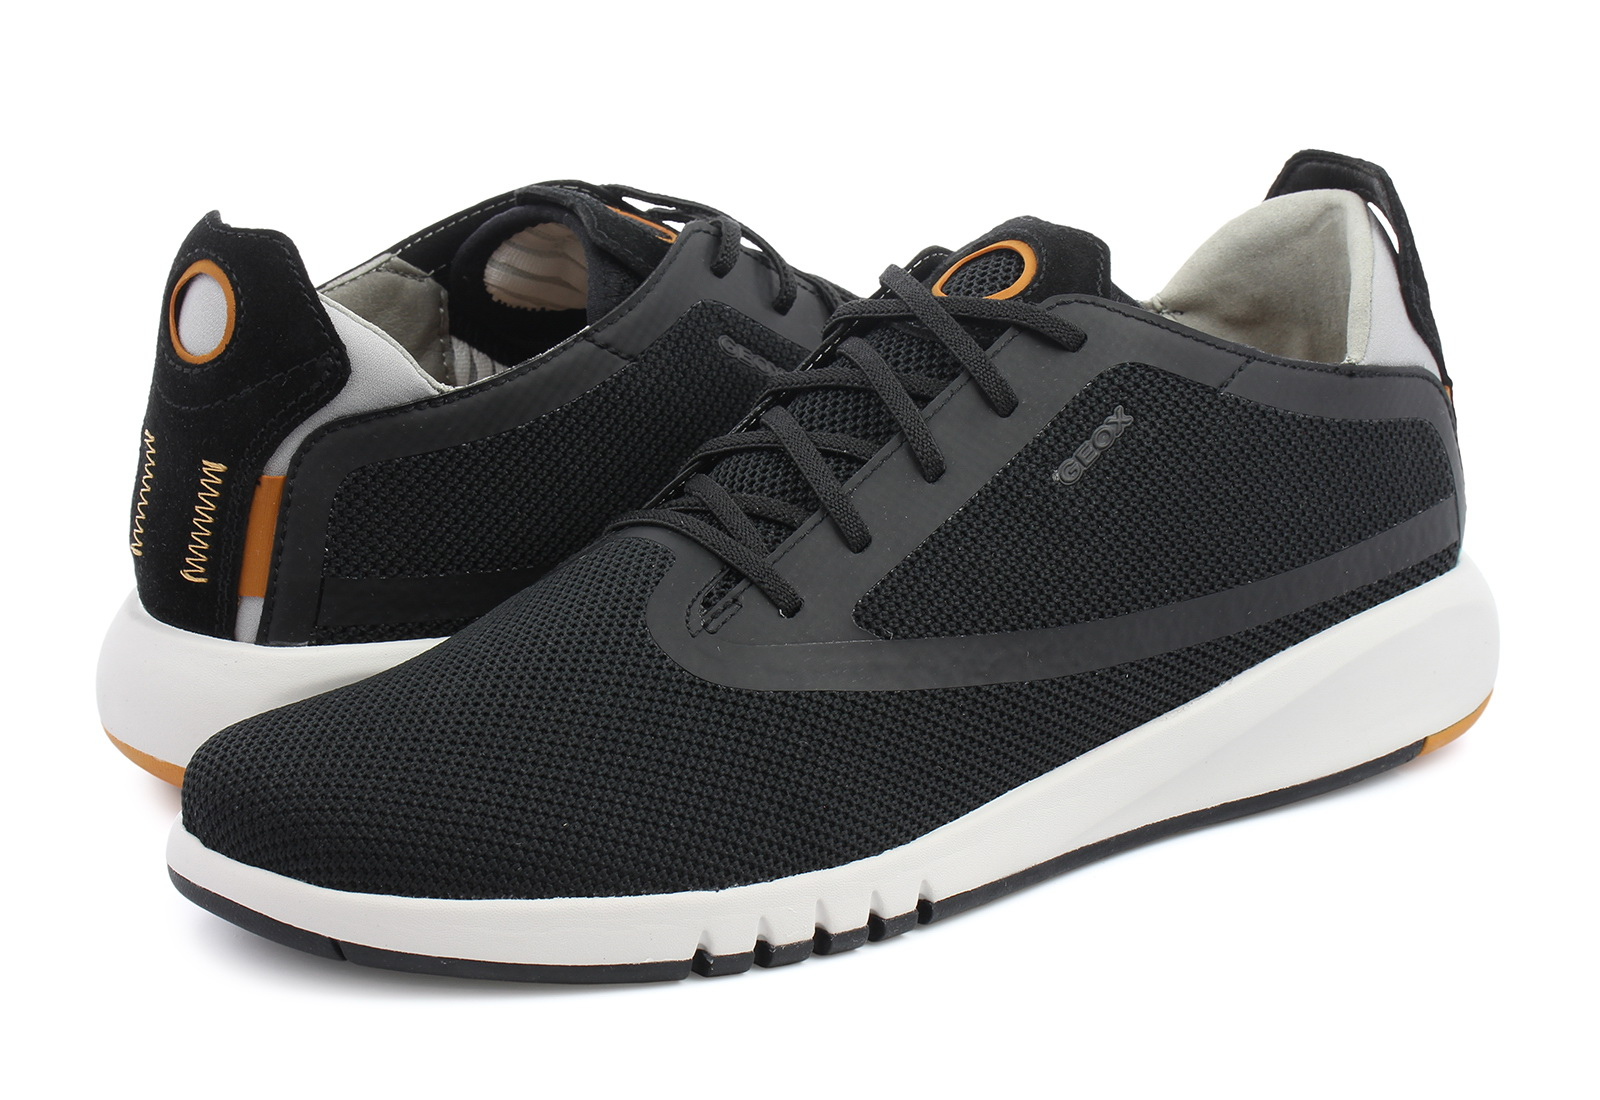 Defectuoso espiral Disfraz  Geox Niske Cipele Crne Cipele - U Aerantis - Office Shoes - Online trgovina  obuće